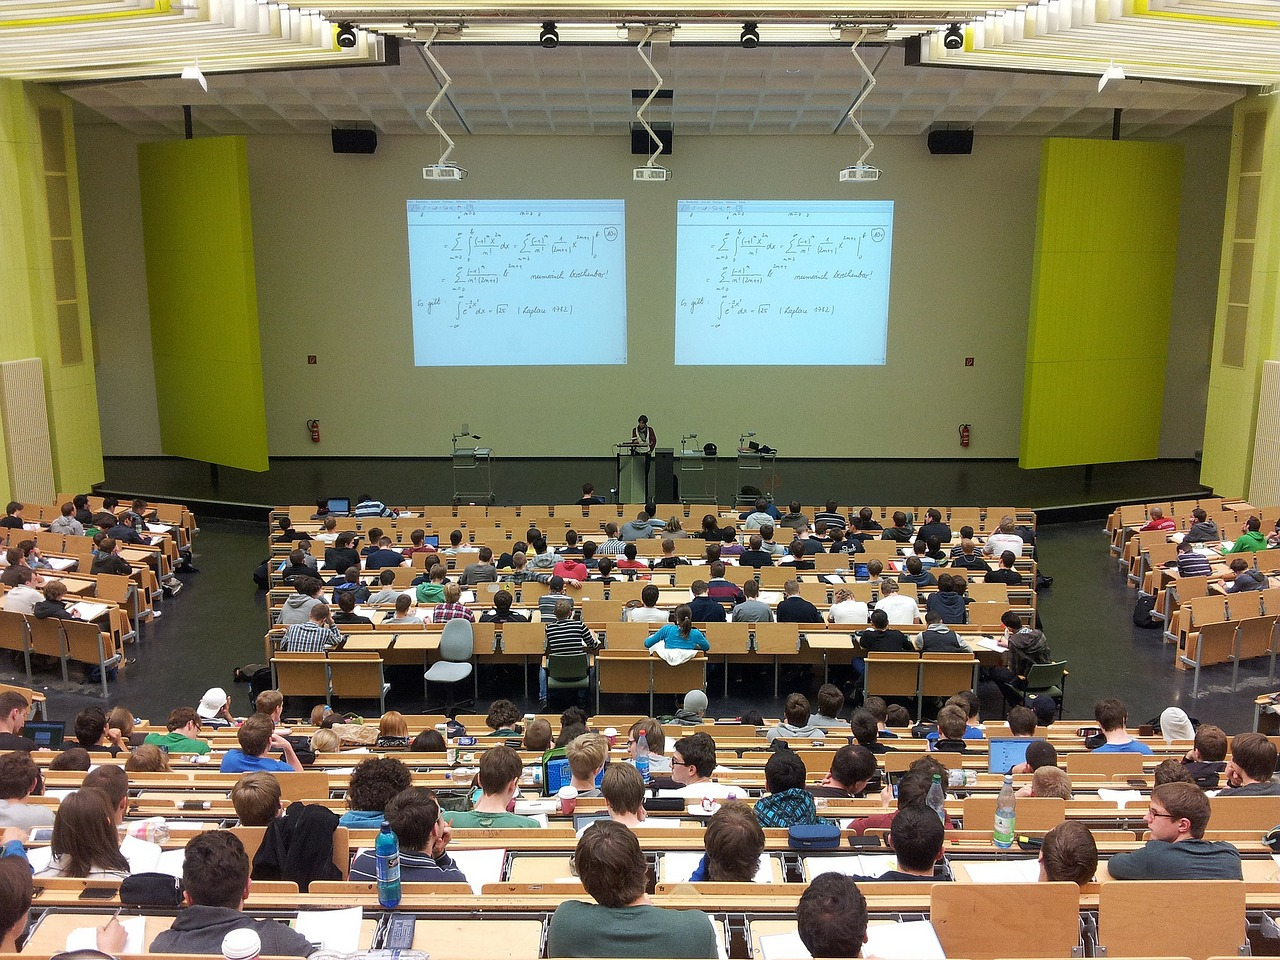 university-105709_1280.jpg